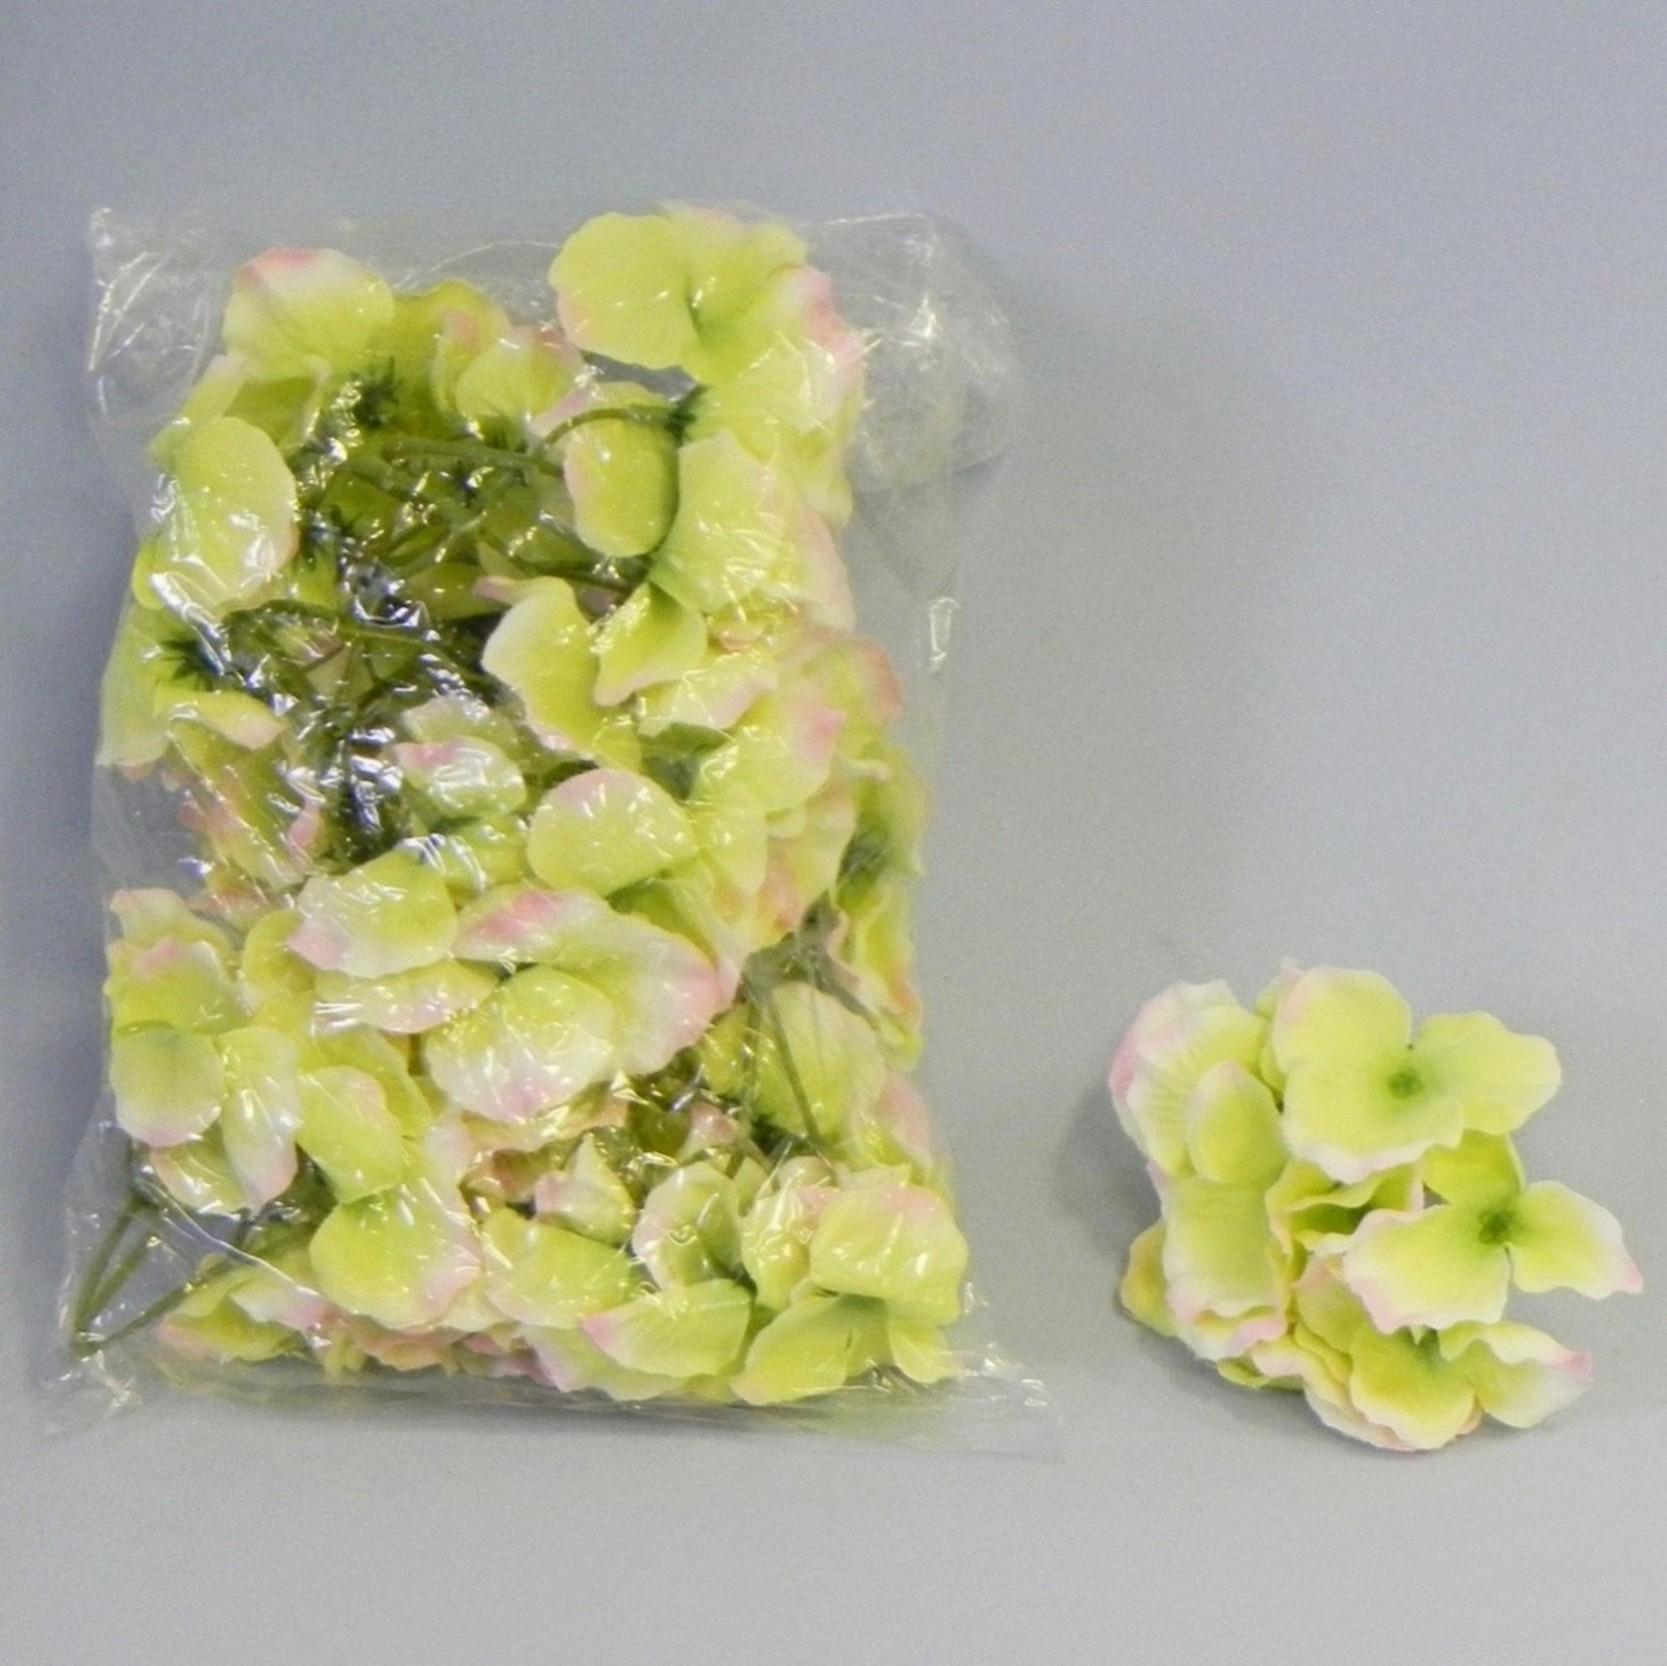 KLIA Umělý květ hortenzie 12ks Barva: žluto-zelená KA09050H/GP/ZLU